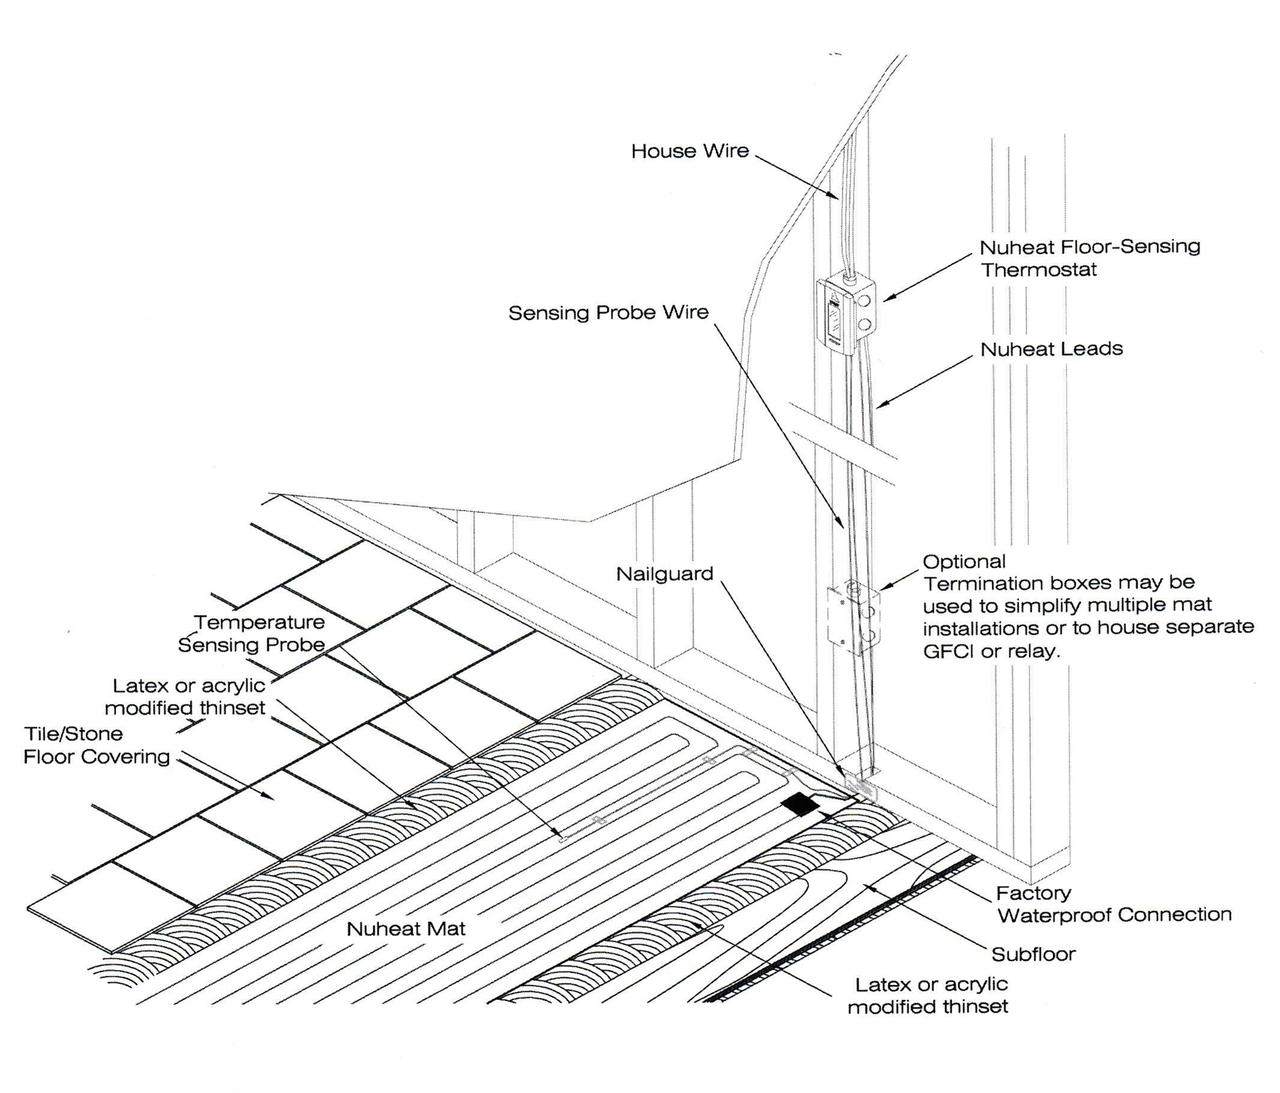 Nuheat electric floor heating mat 12 ft series 240 volt 8200c04b 5690 4bd7 ac04 34514626124b 54065 nuheat g144mat nuheat wiring diagram with in